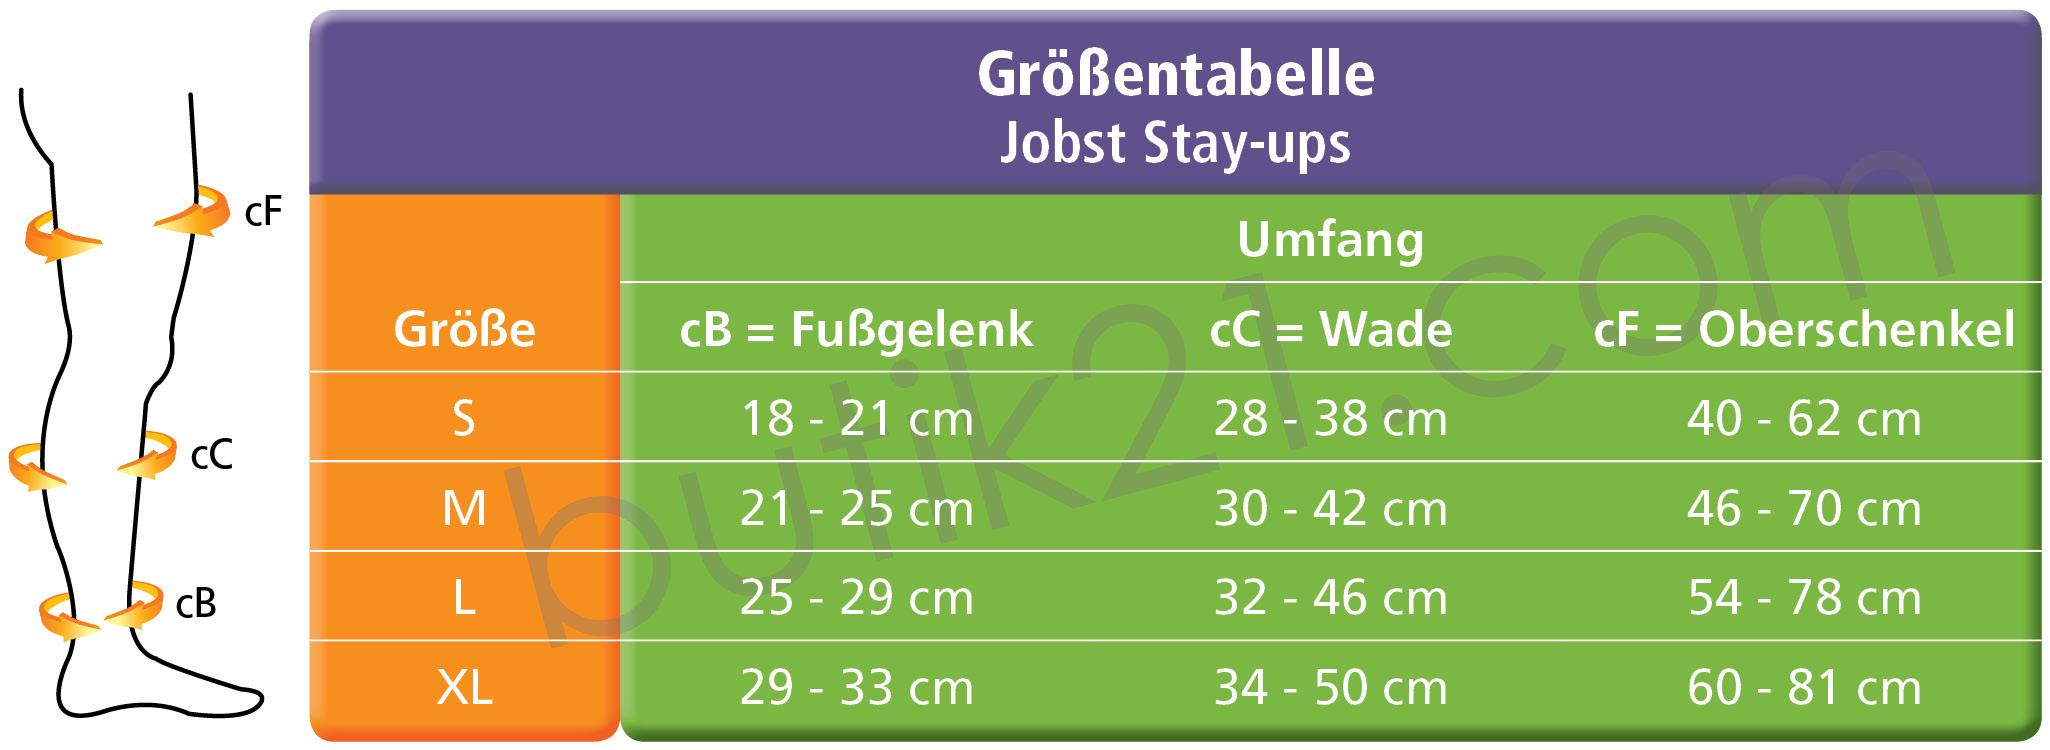 Grössentabelle Jobst UltraSheer Stay-ups